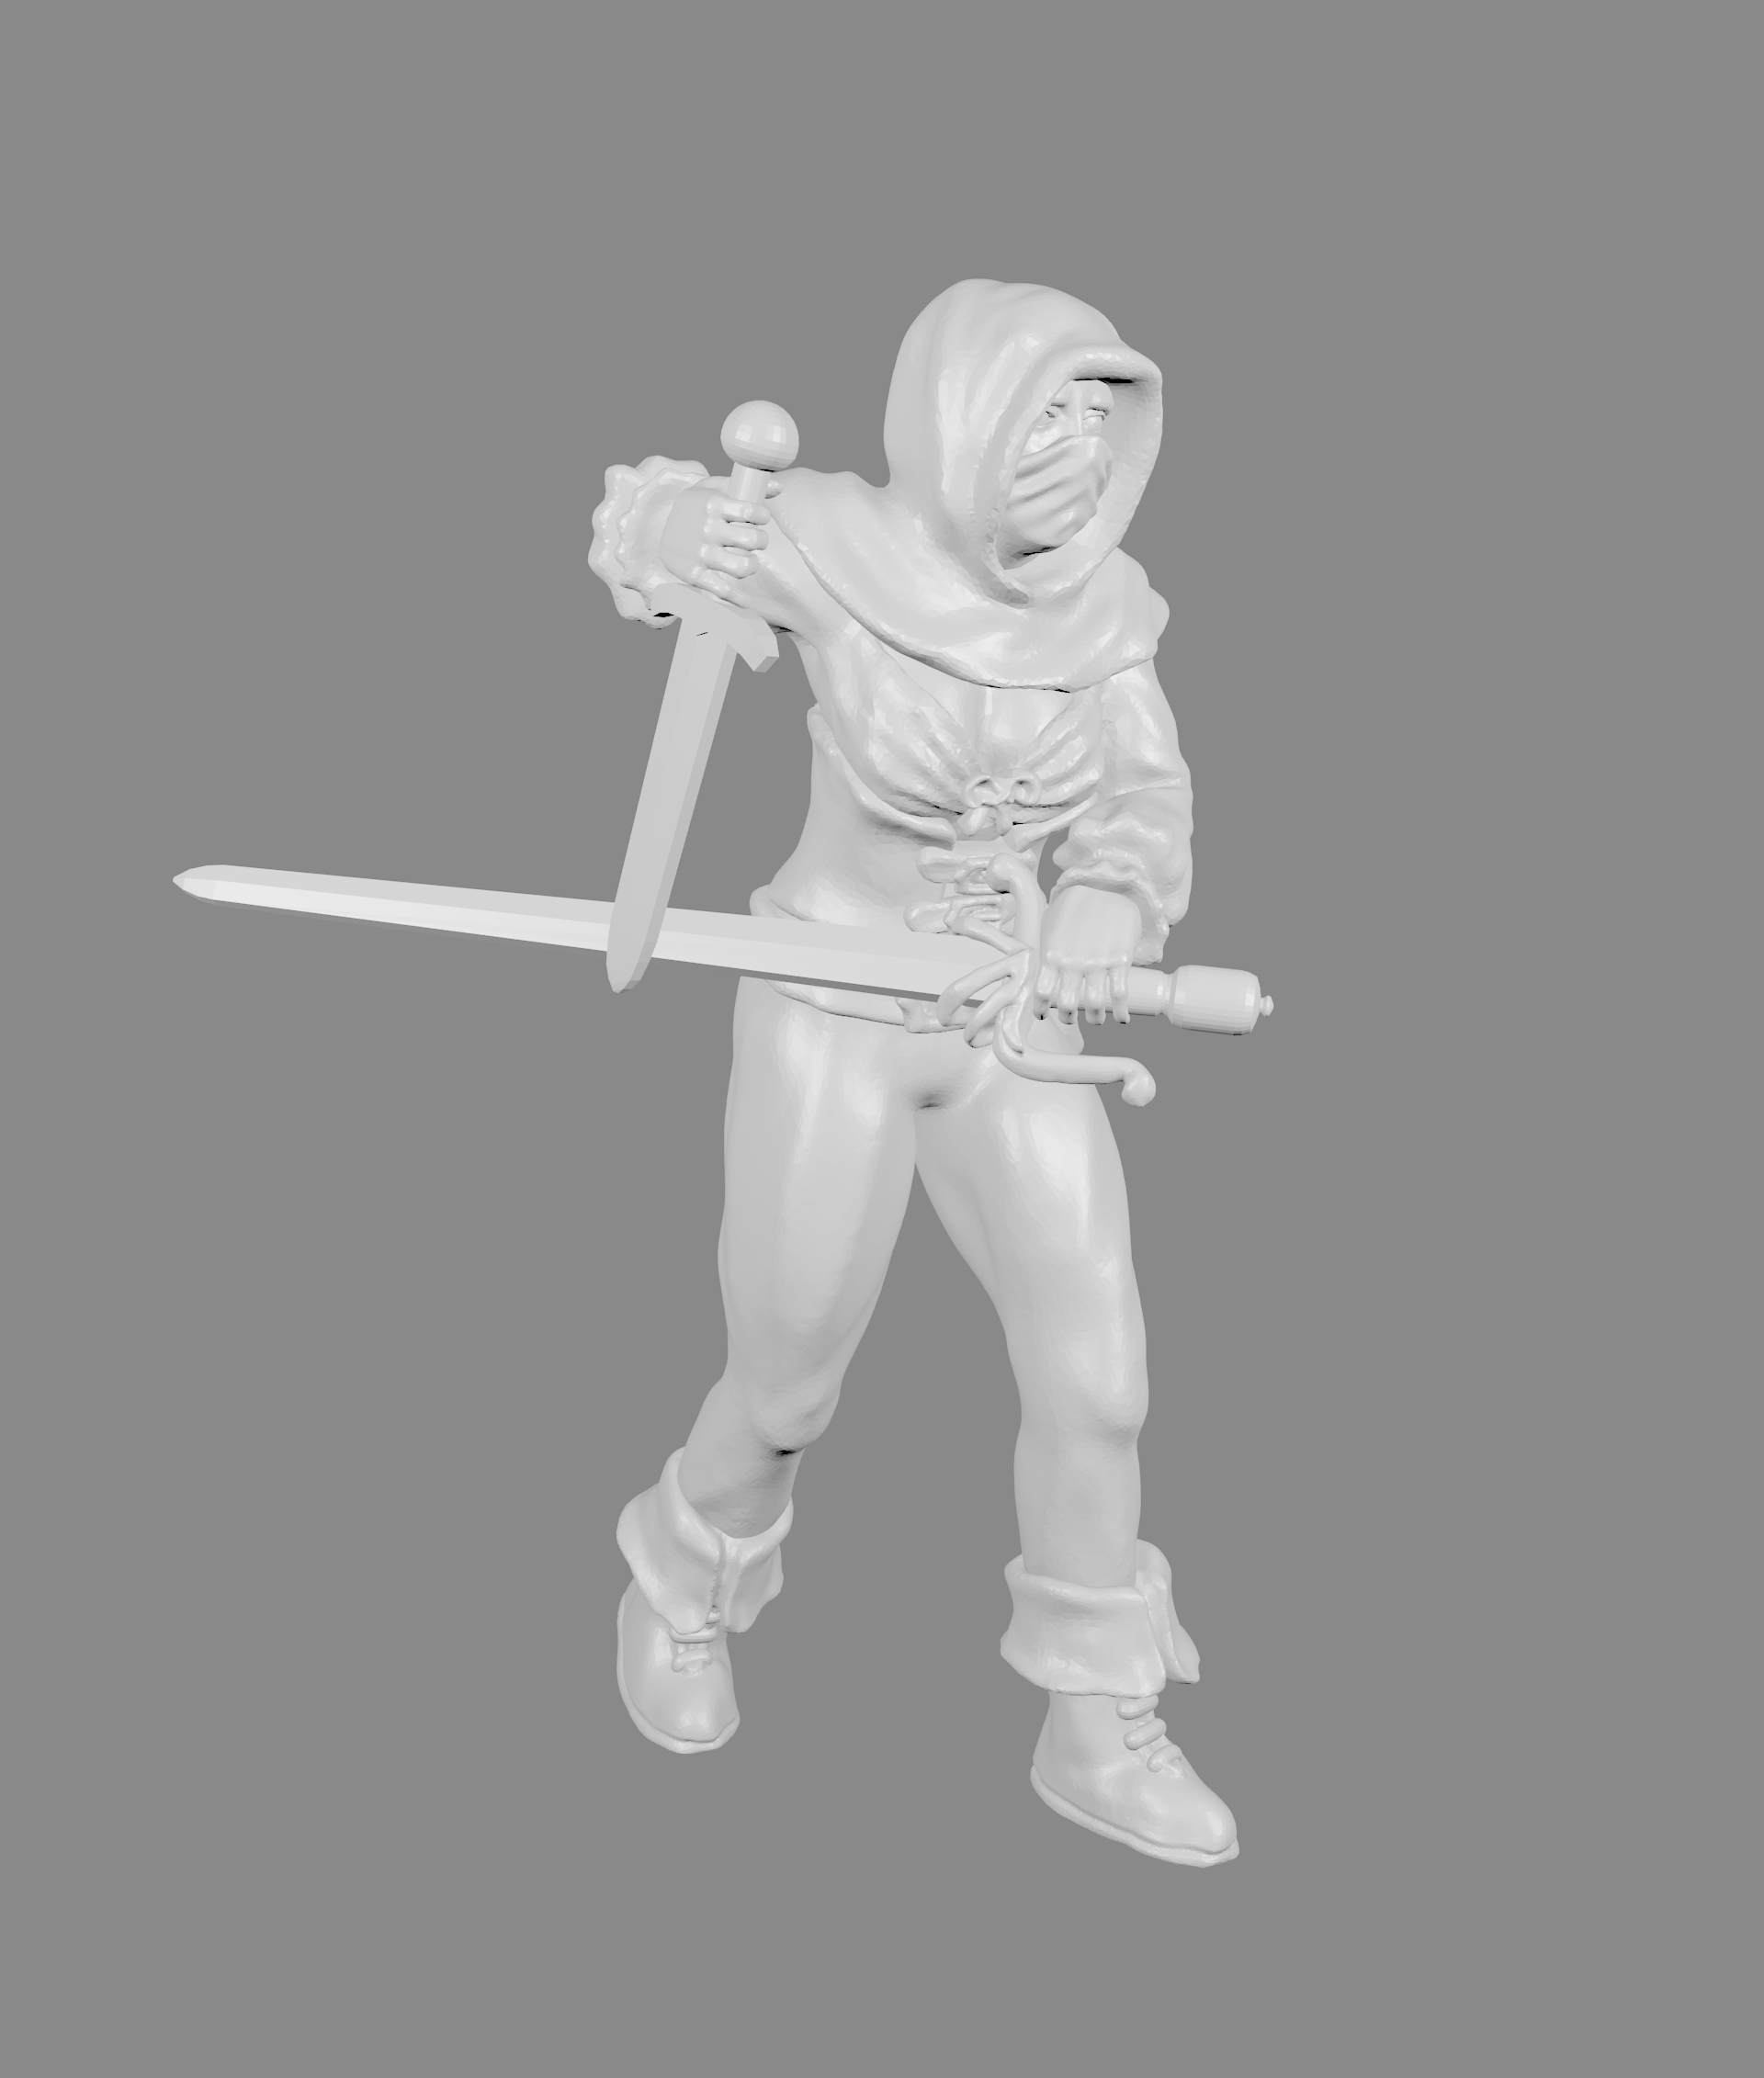 Female_Thief_pic_v2.png Download free STL file Female Thief/Treasure Hunter Miniature • 3D print model, Ilhadiel